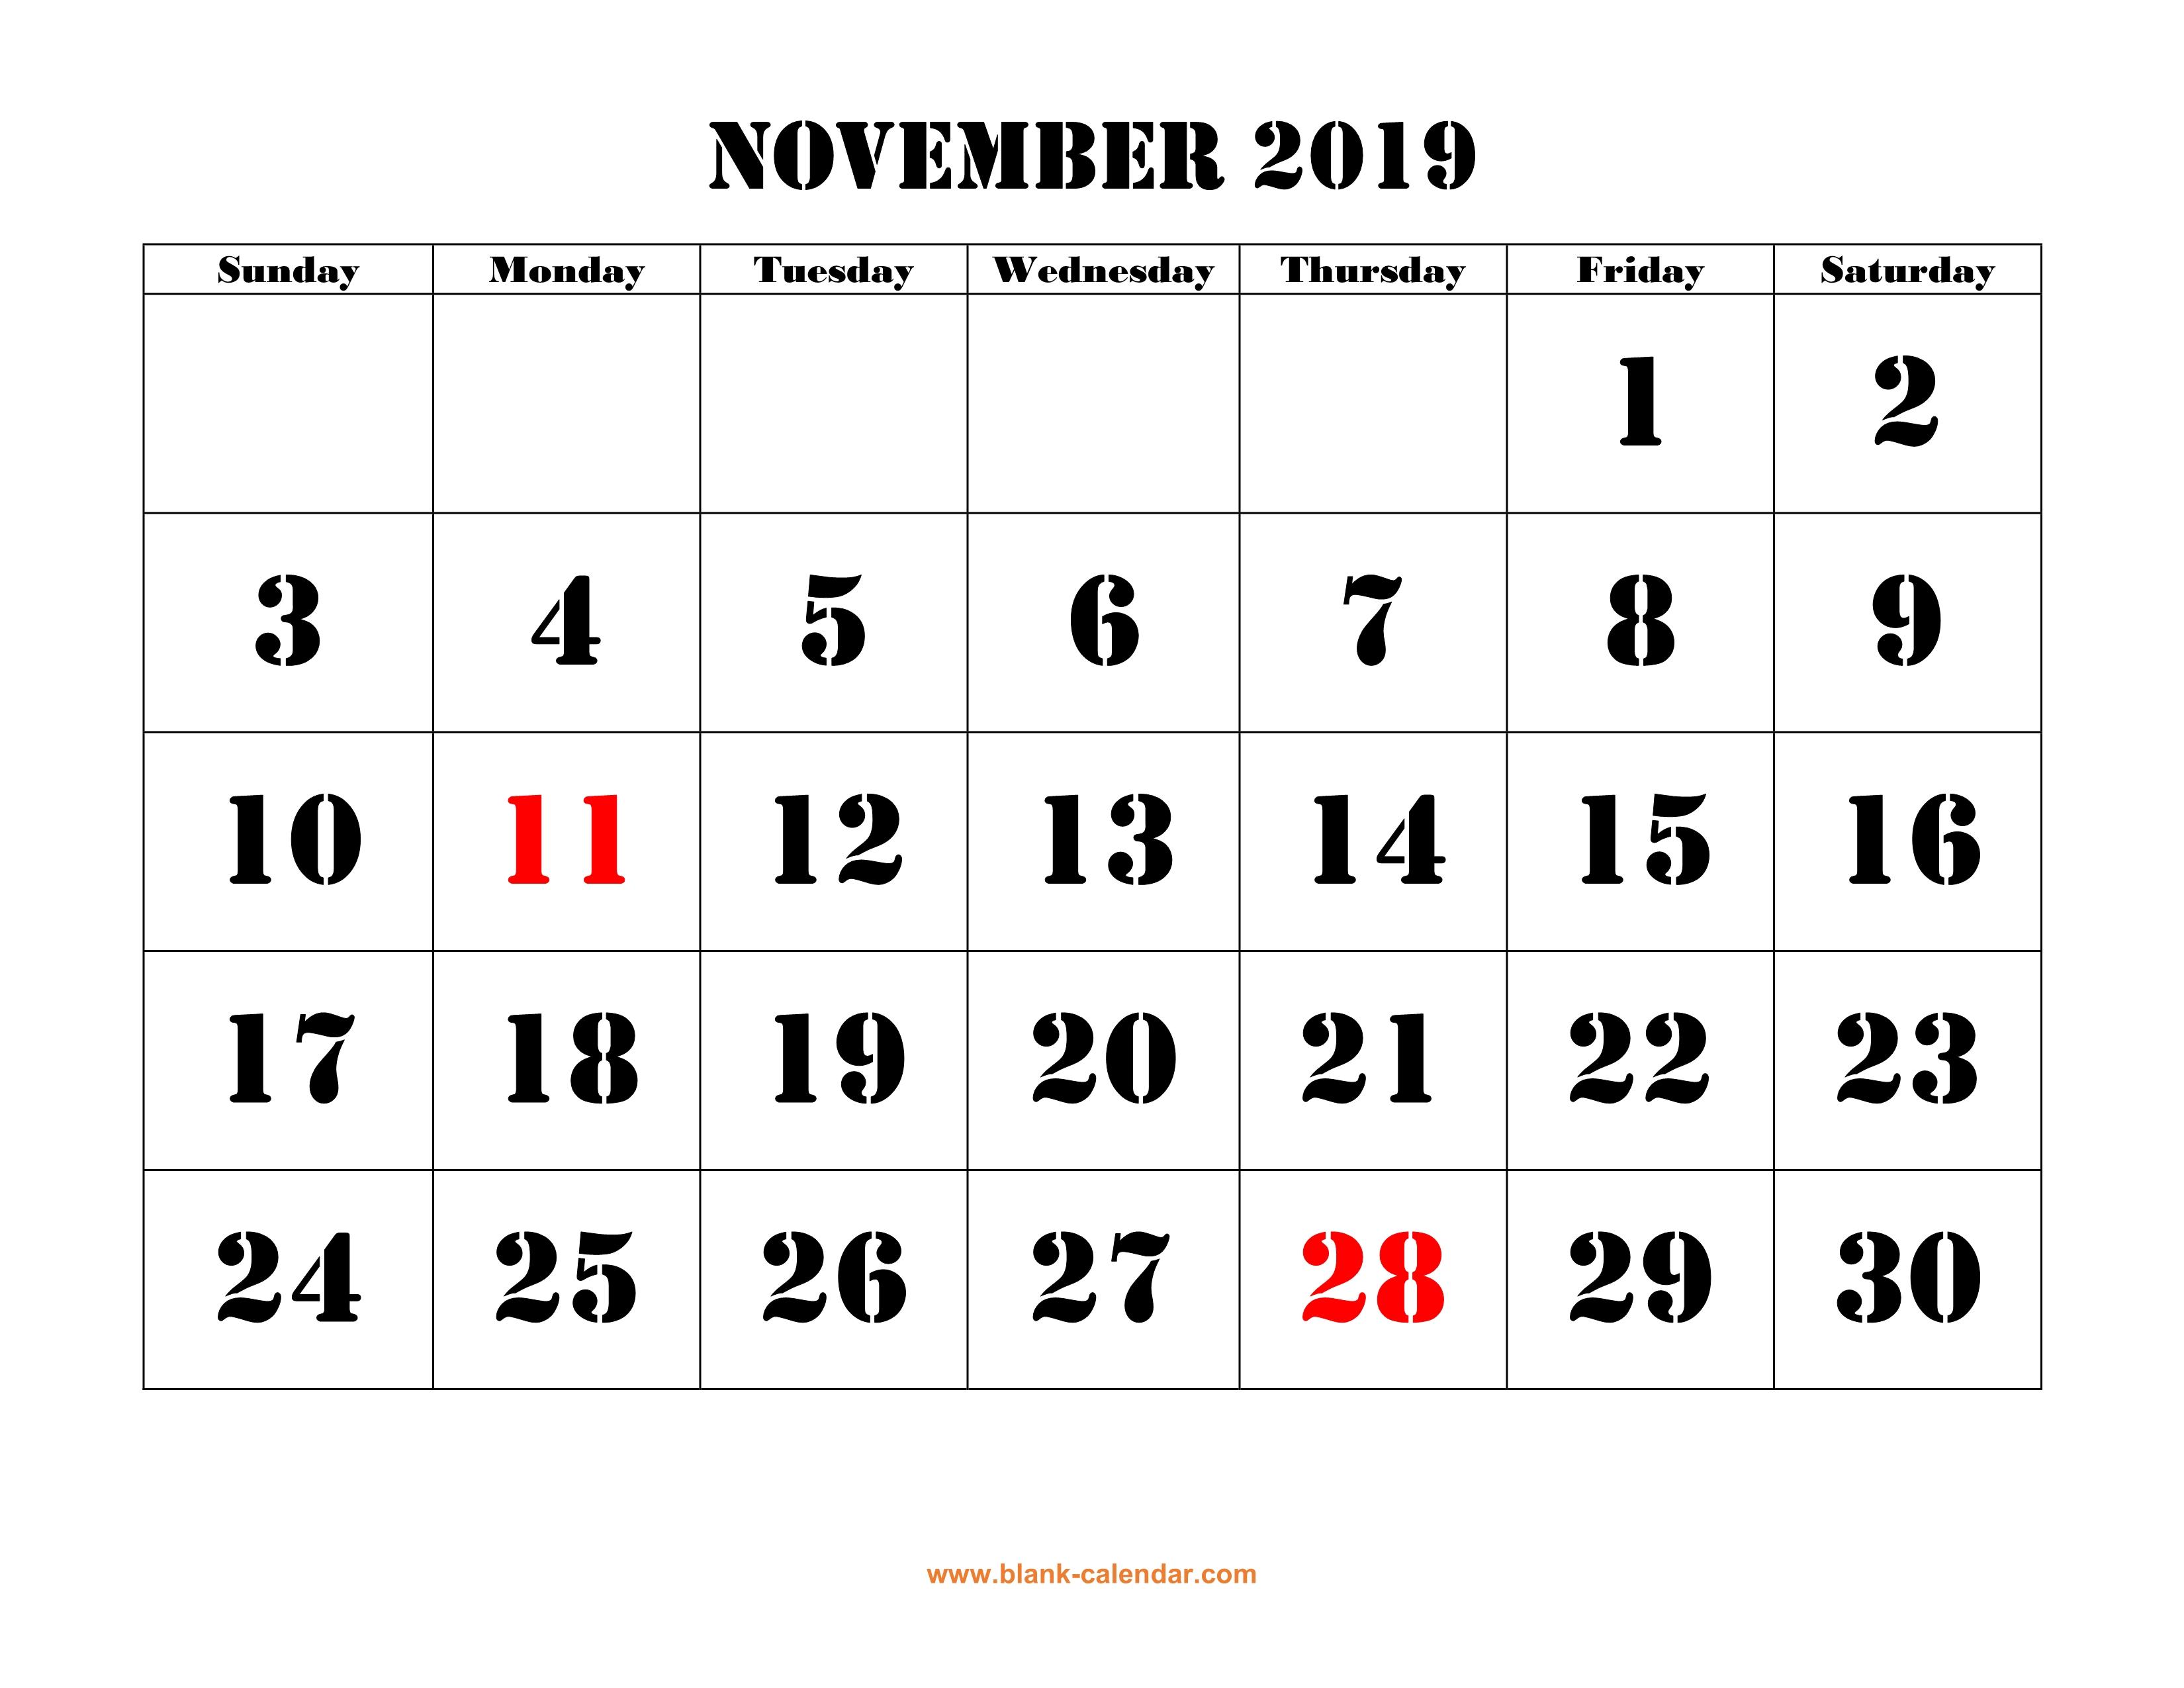 Free Download Printable November 2019 Calendar, Large Font Design for Blank Printable November Calendar